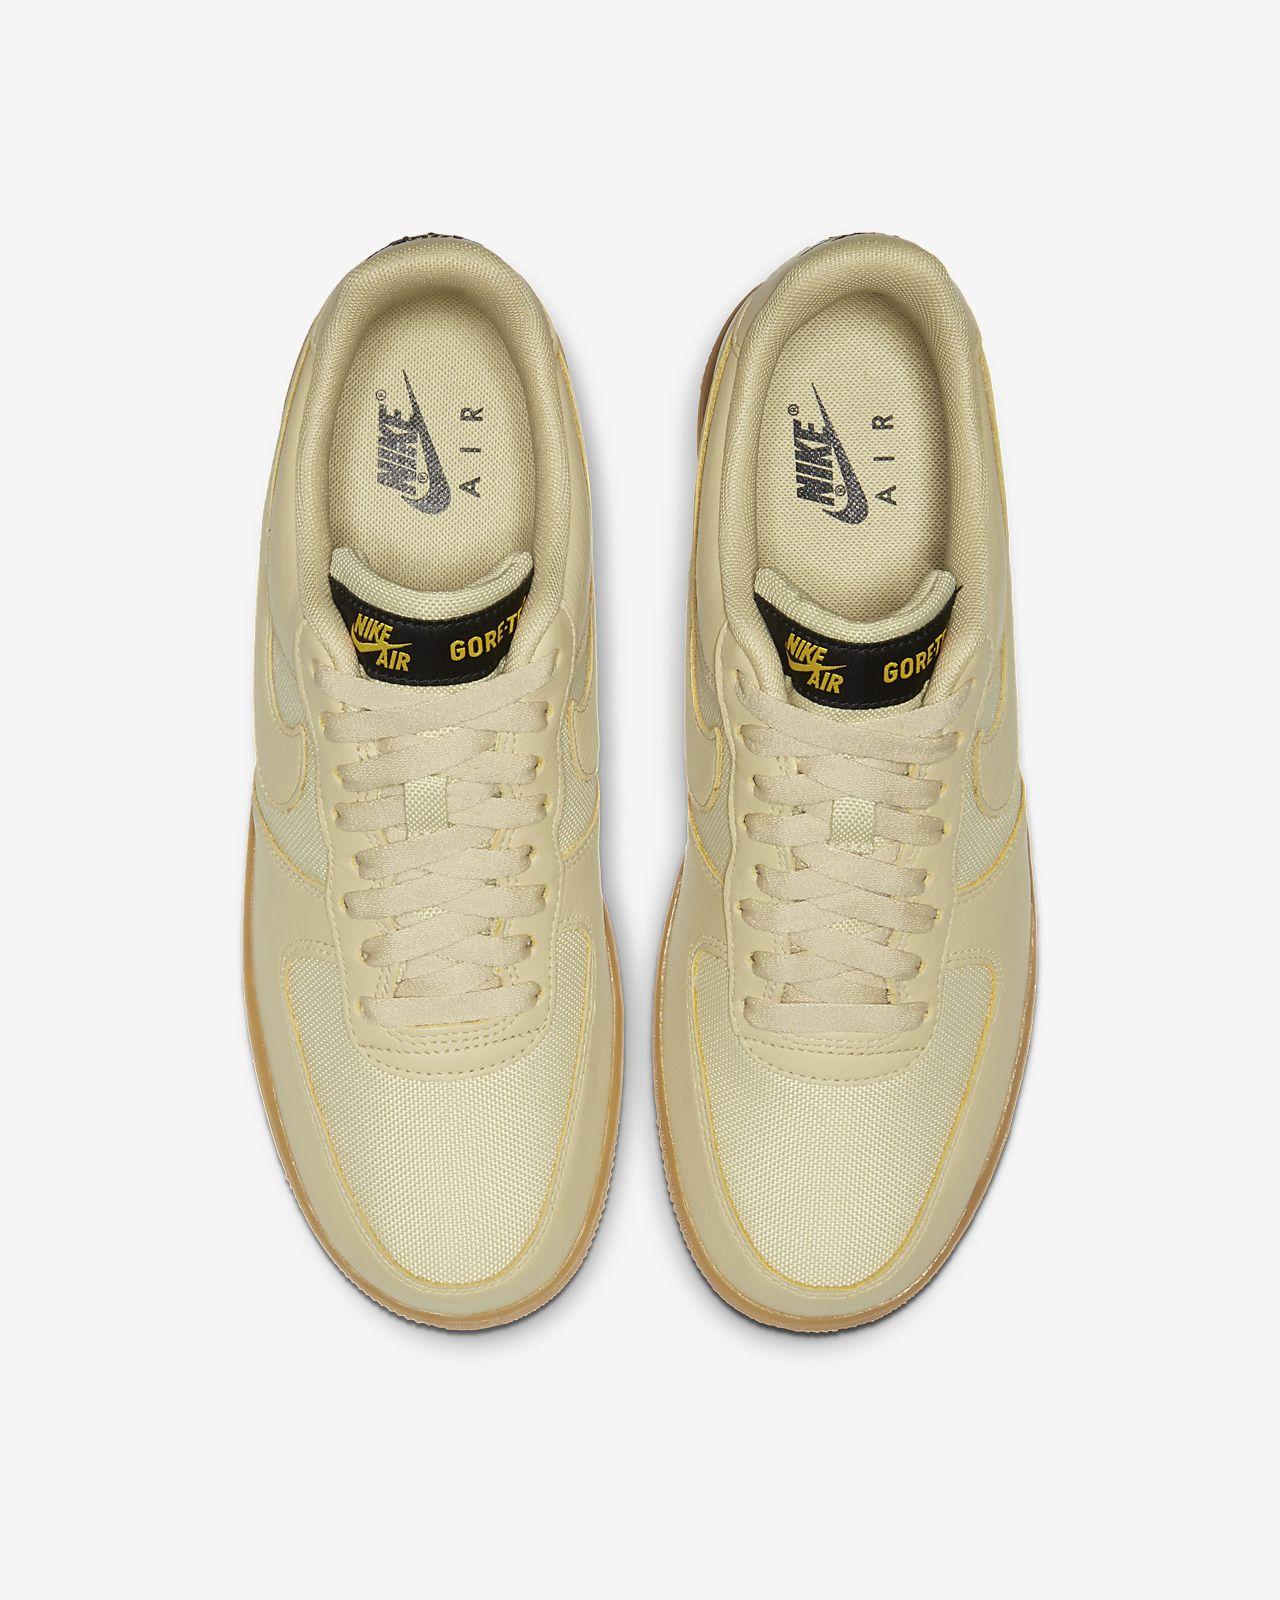 Nike Air Force 1 GORE TEX sko